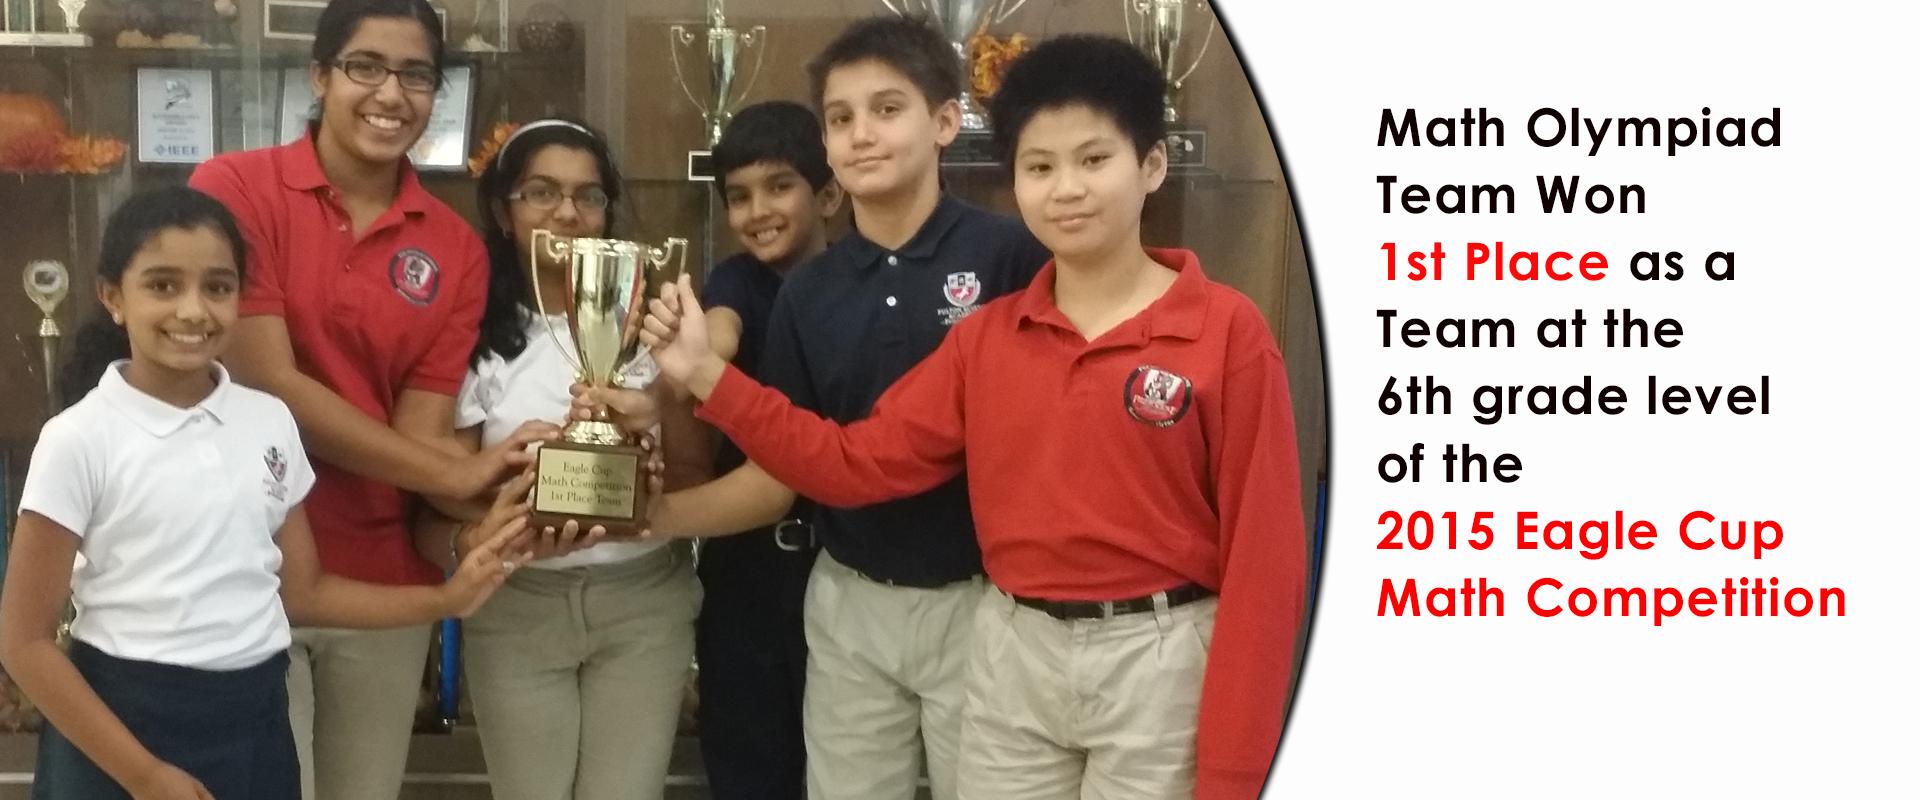 Fulton Science Academy Math eaglecup